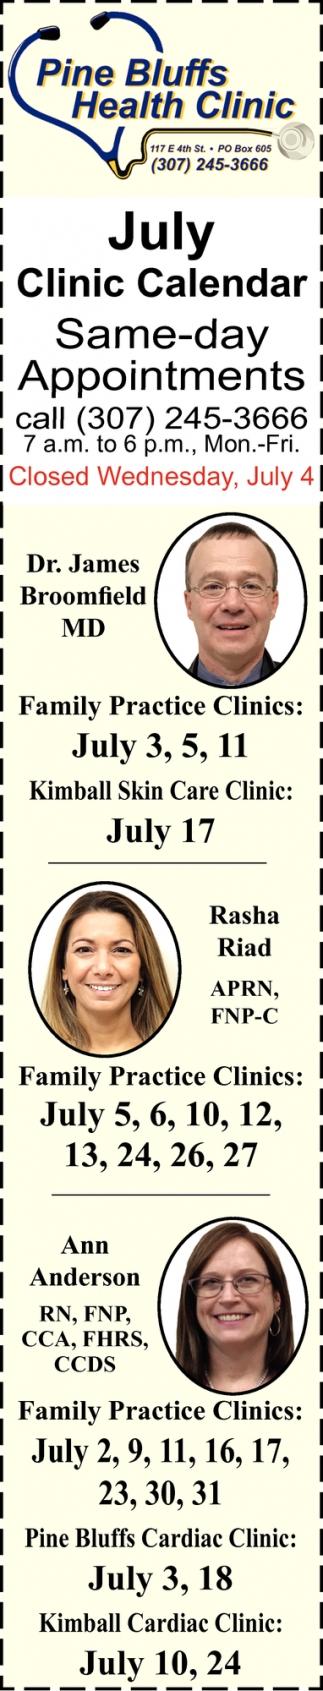 July Clinic Calendar